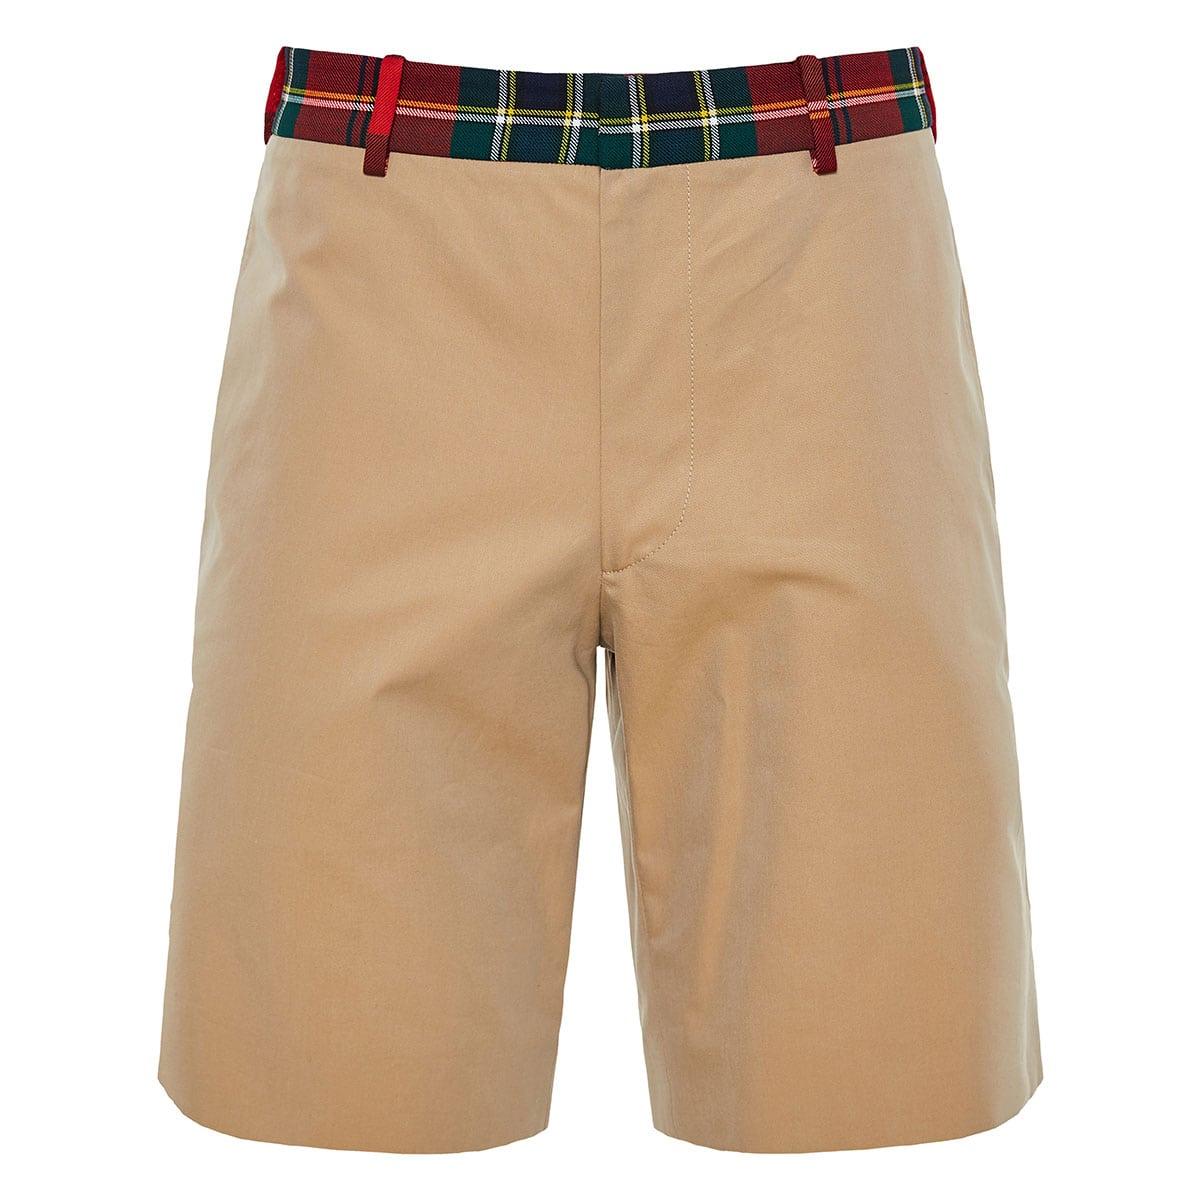 Tartan-trimmed bermuda shorts